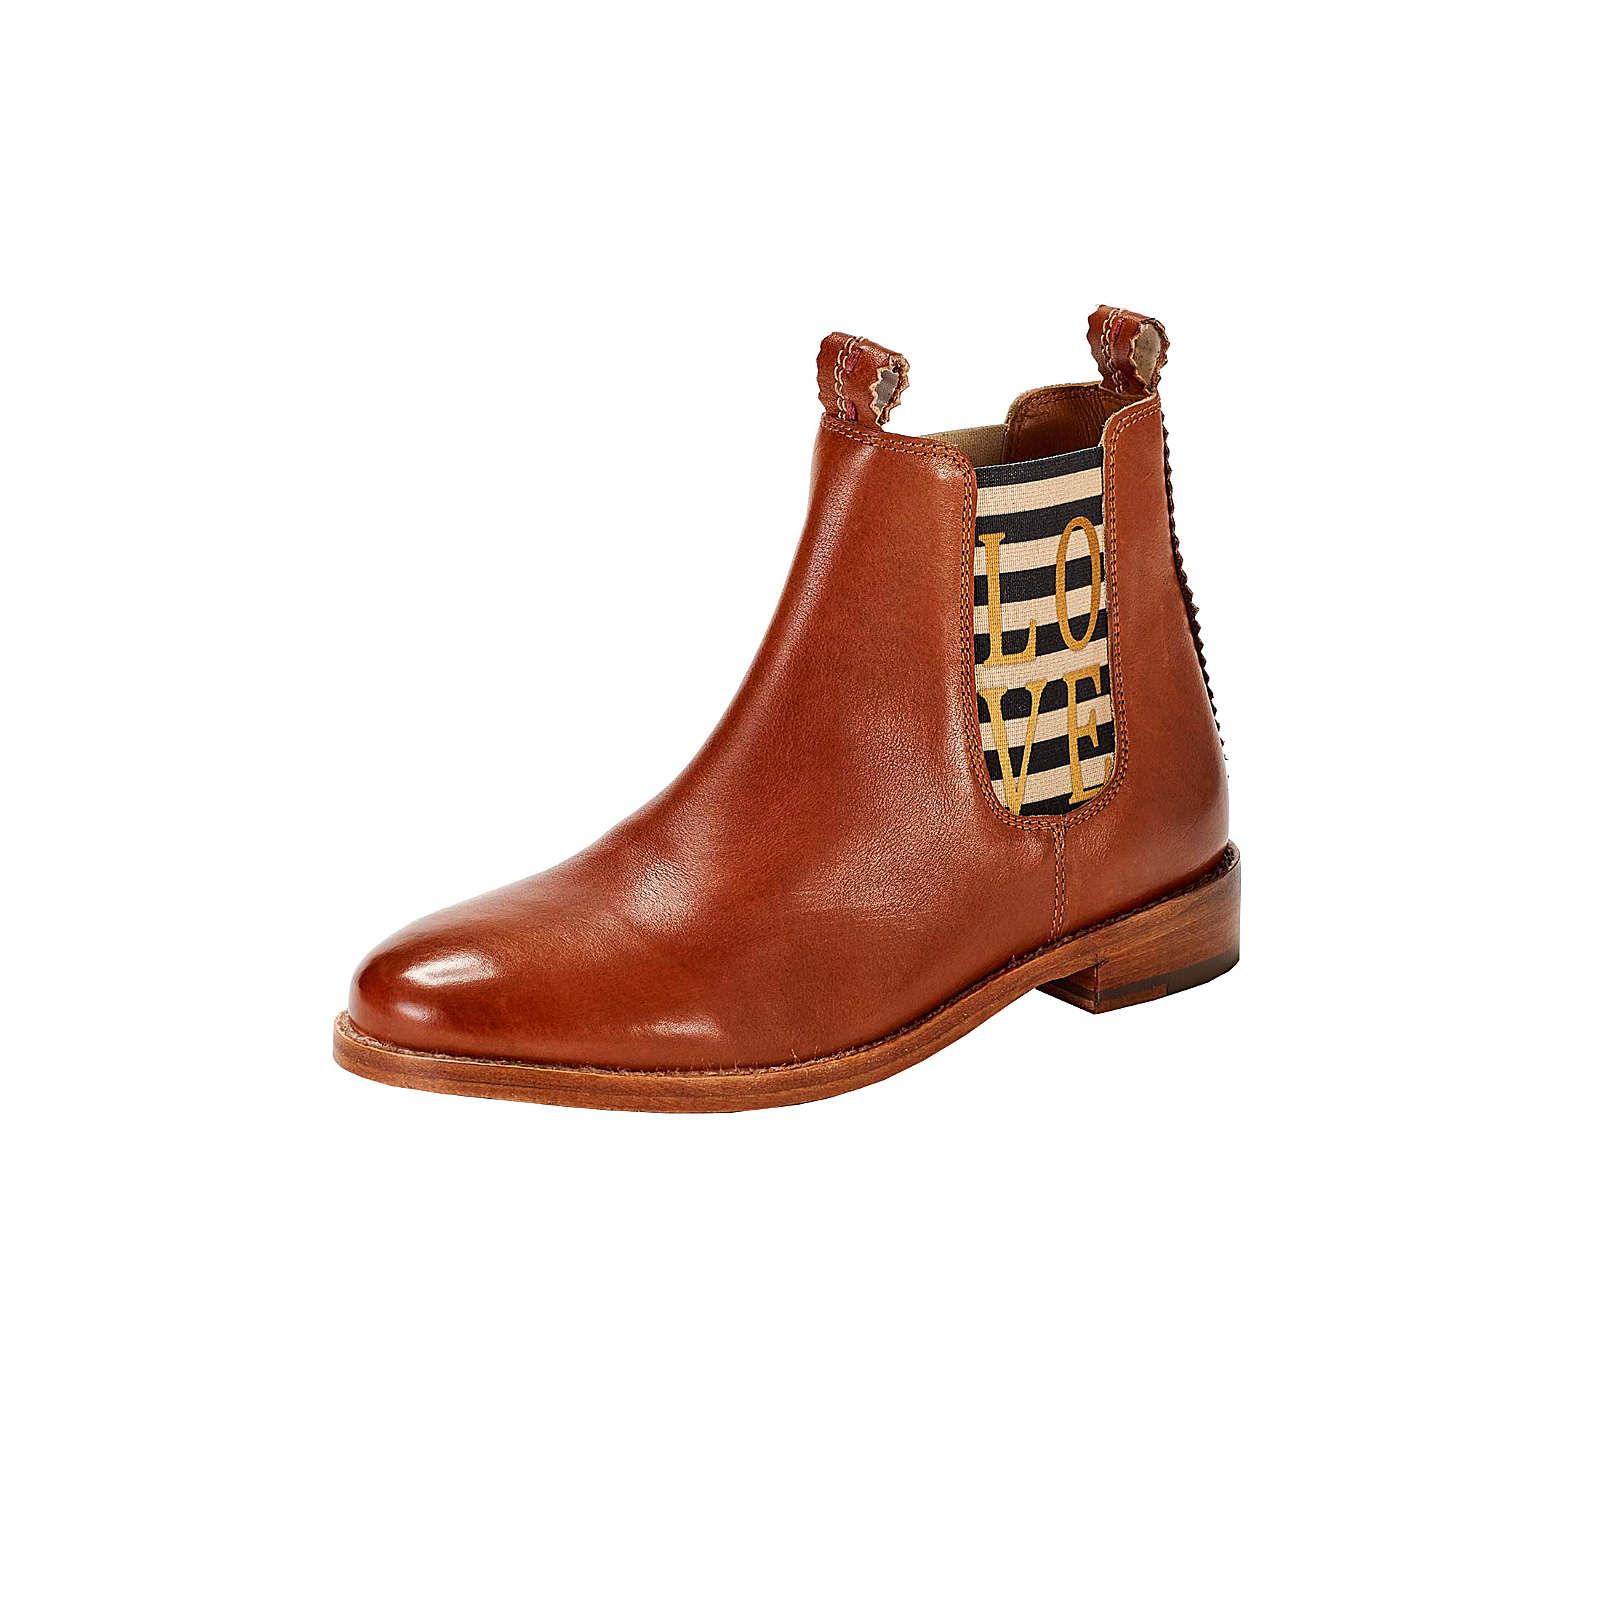 CRICKIT Chelsea Boot LENA mit goldenem Love Chelsea Boots cognac Damen Gr. 36